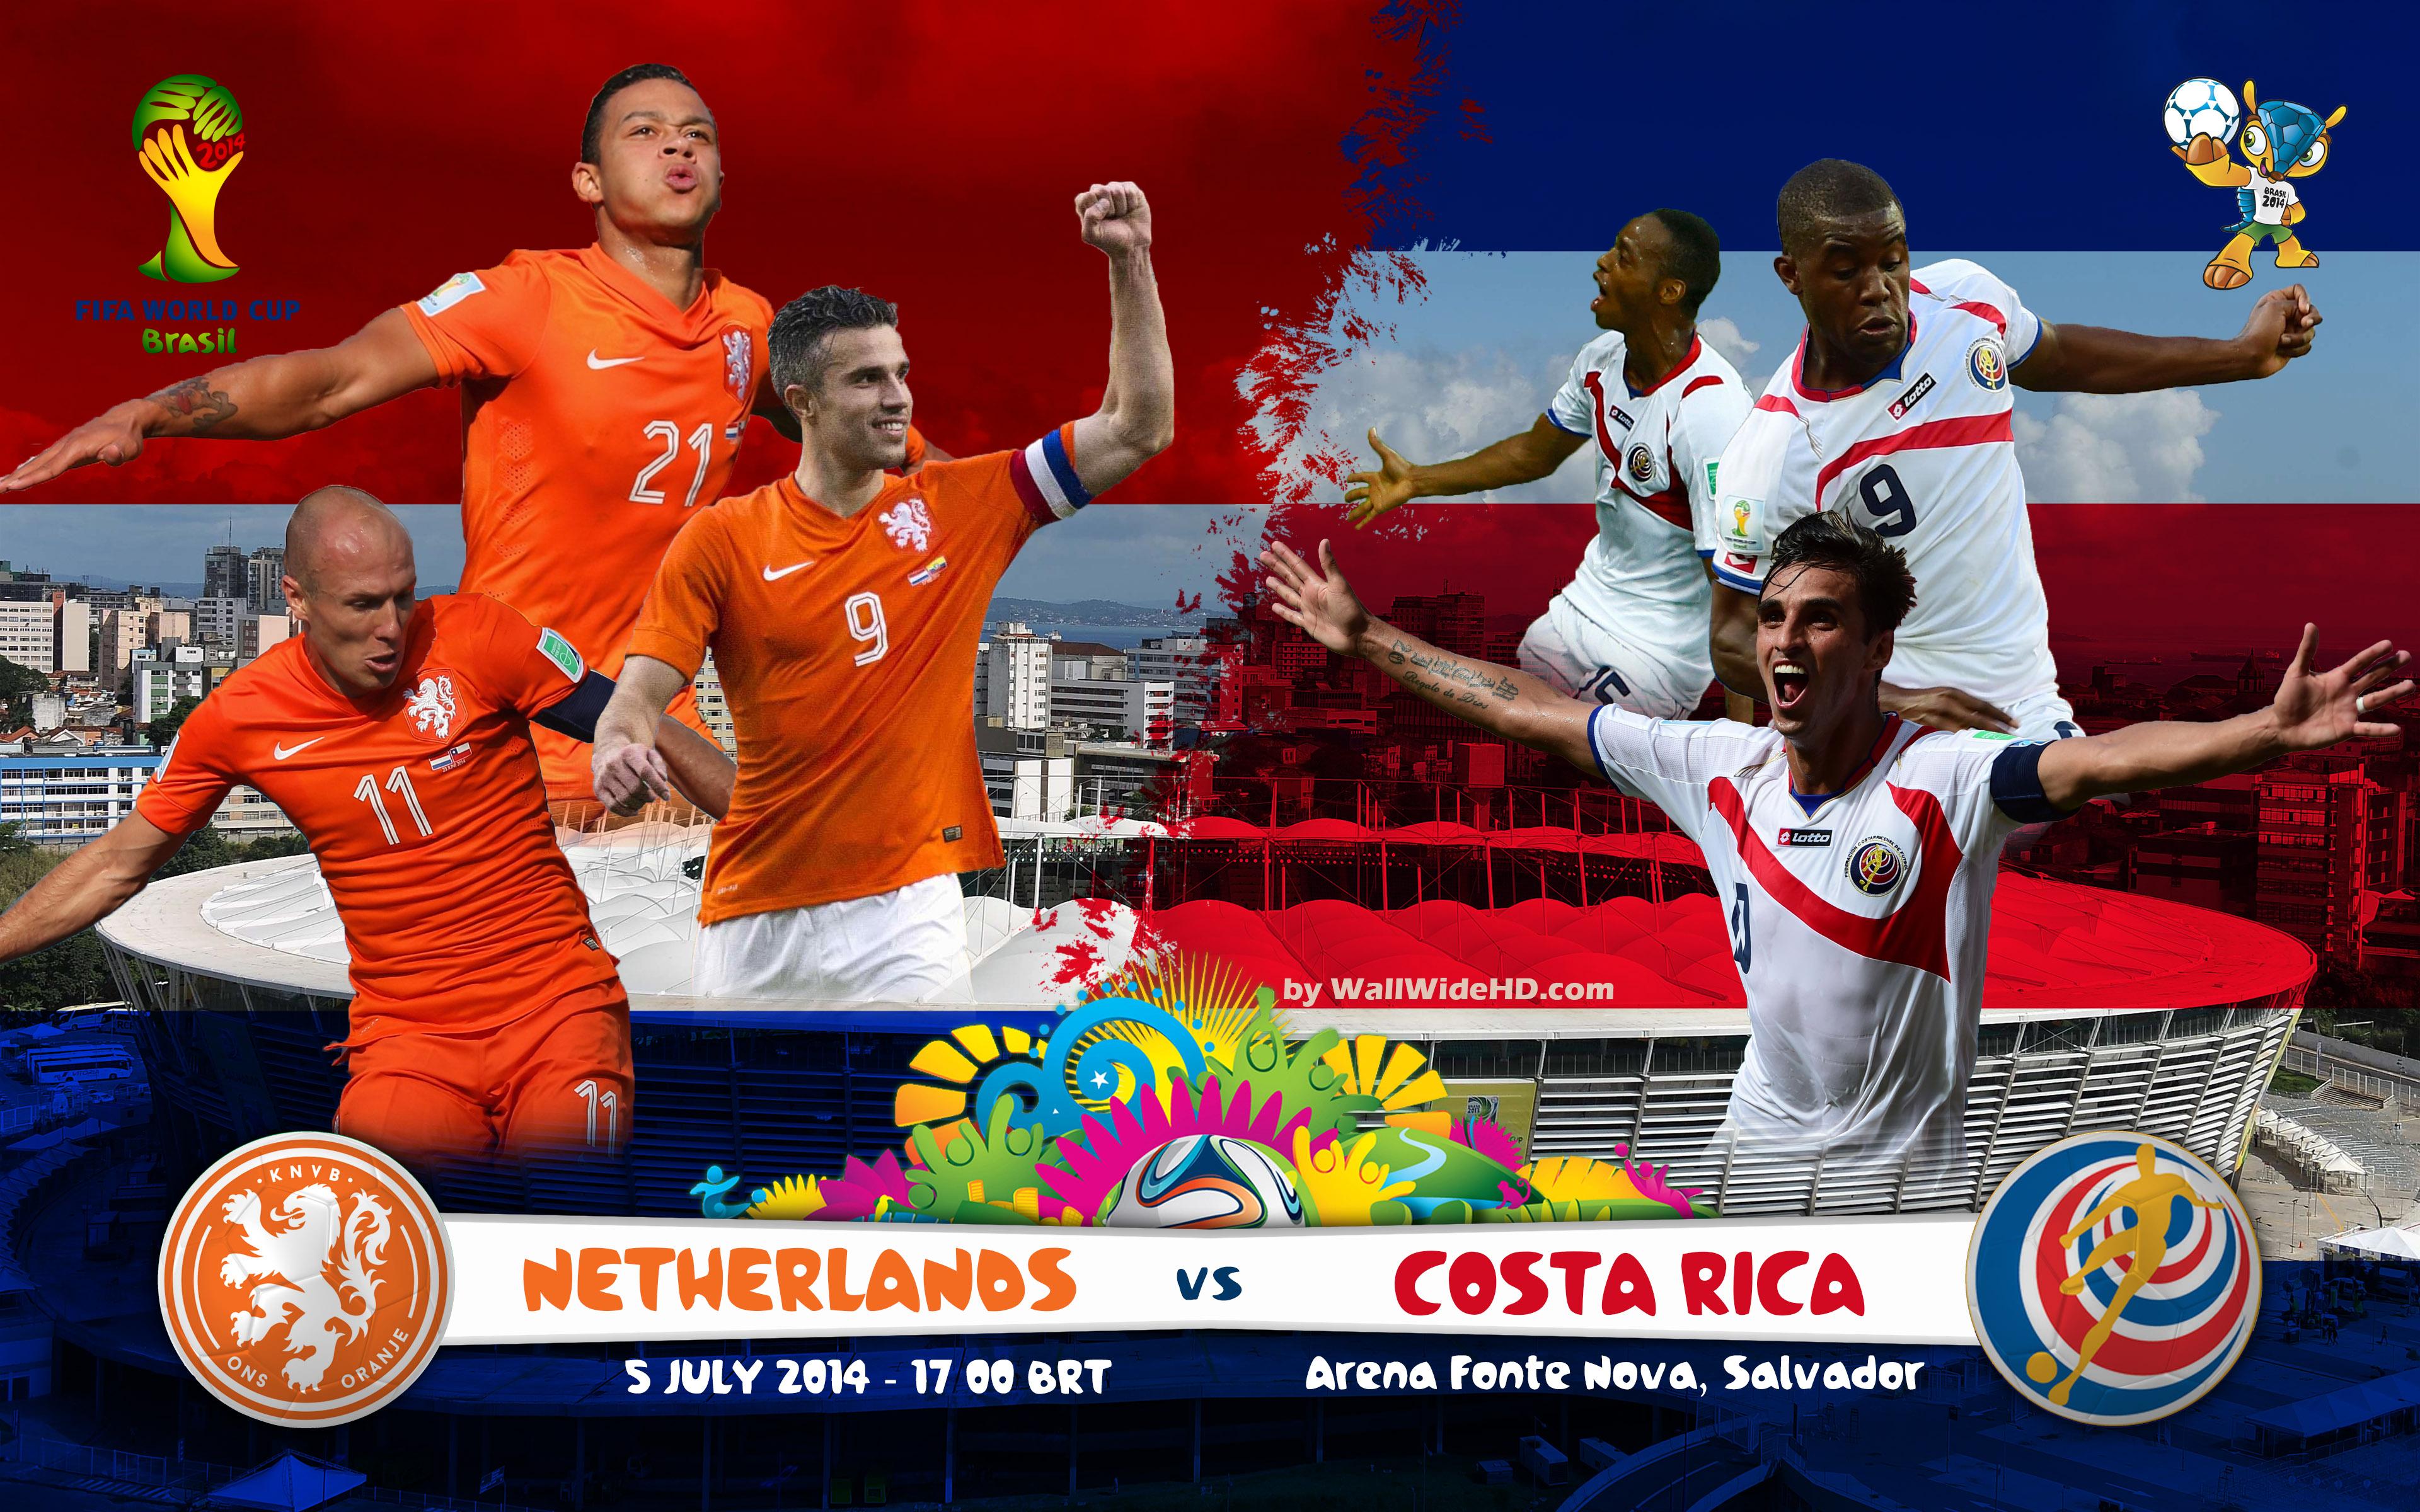 Netherlands-vs-Costa-Rica-2014-World-Cup-Quarter-finals-Football